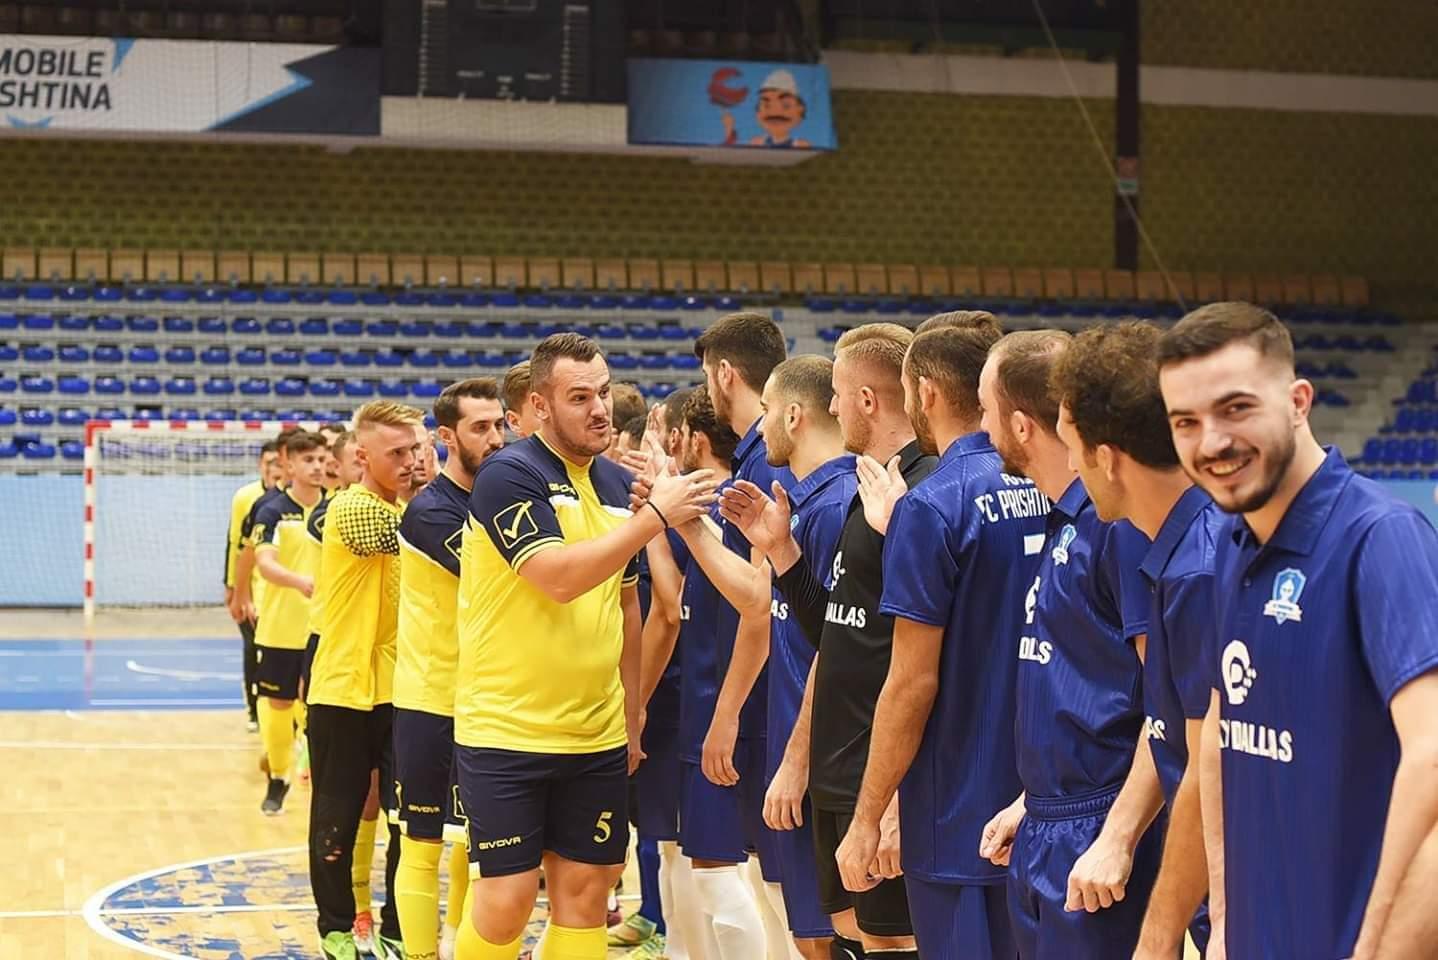 Futsall: FC Prishtina 01 e nis me fitore